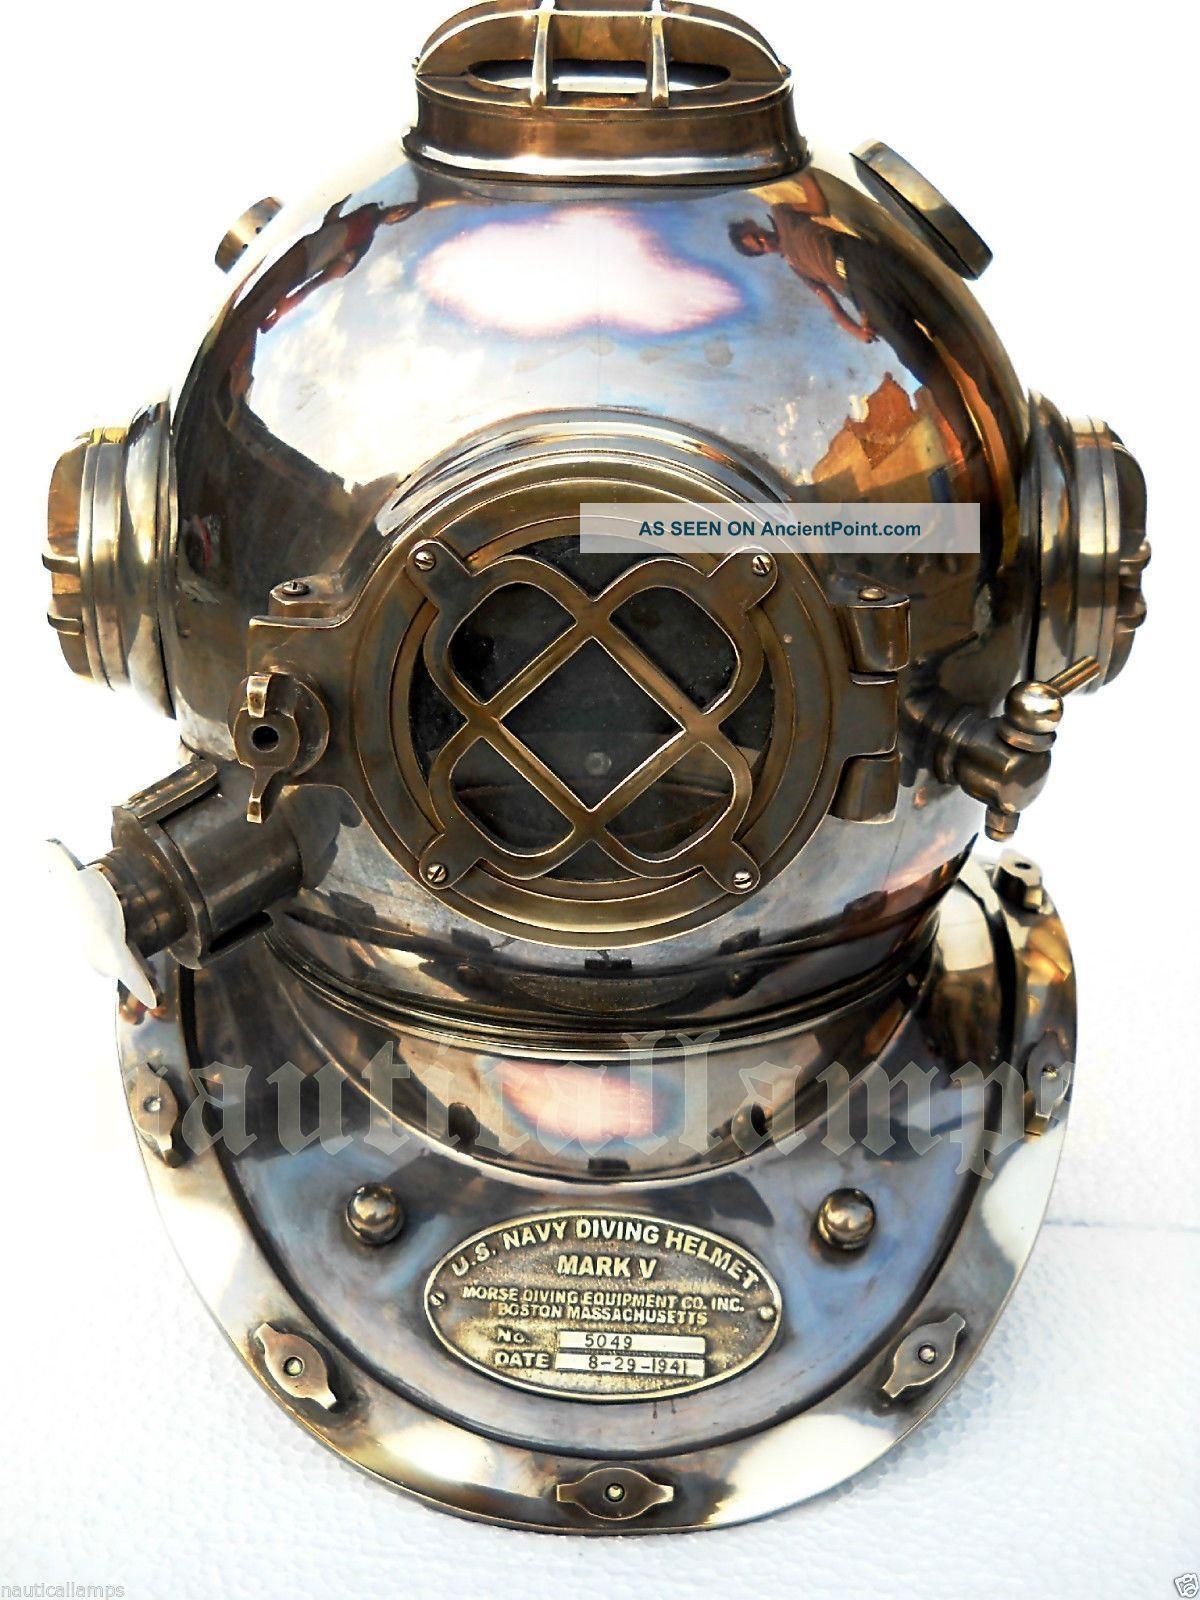 Antique U.  S Navy Brass Divers Diving Helmet Mark V Full Size Deep Sea Scuba Ixn See more Antique U.s Navy-brass Divers Diving Helmet Ma... photo